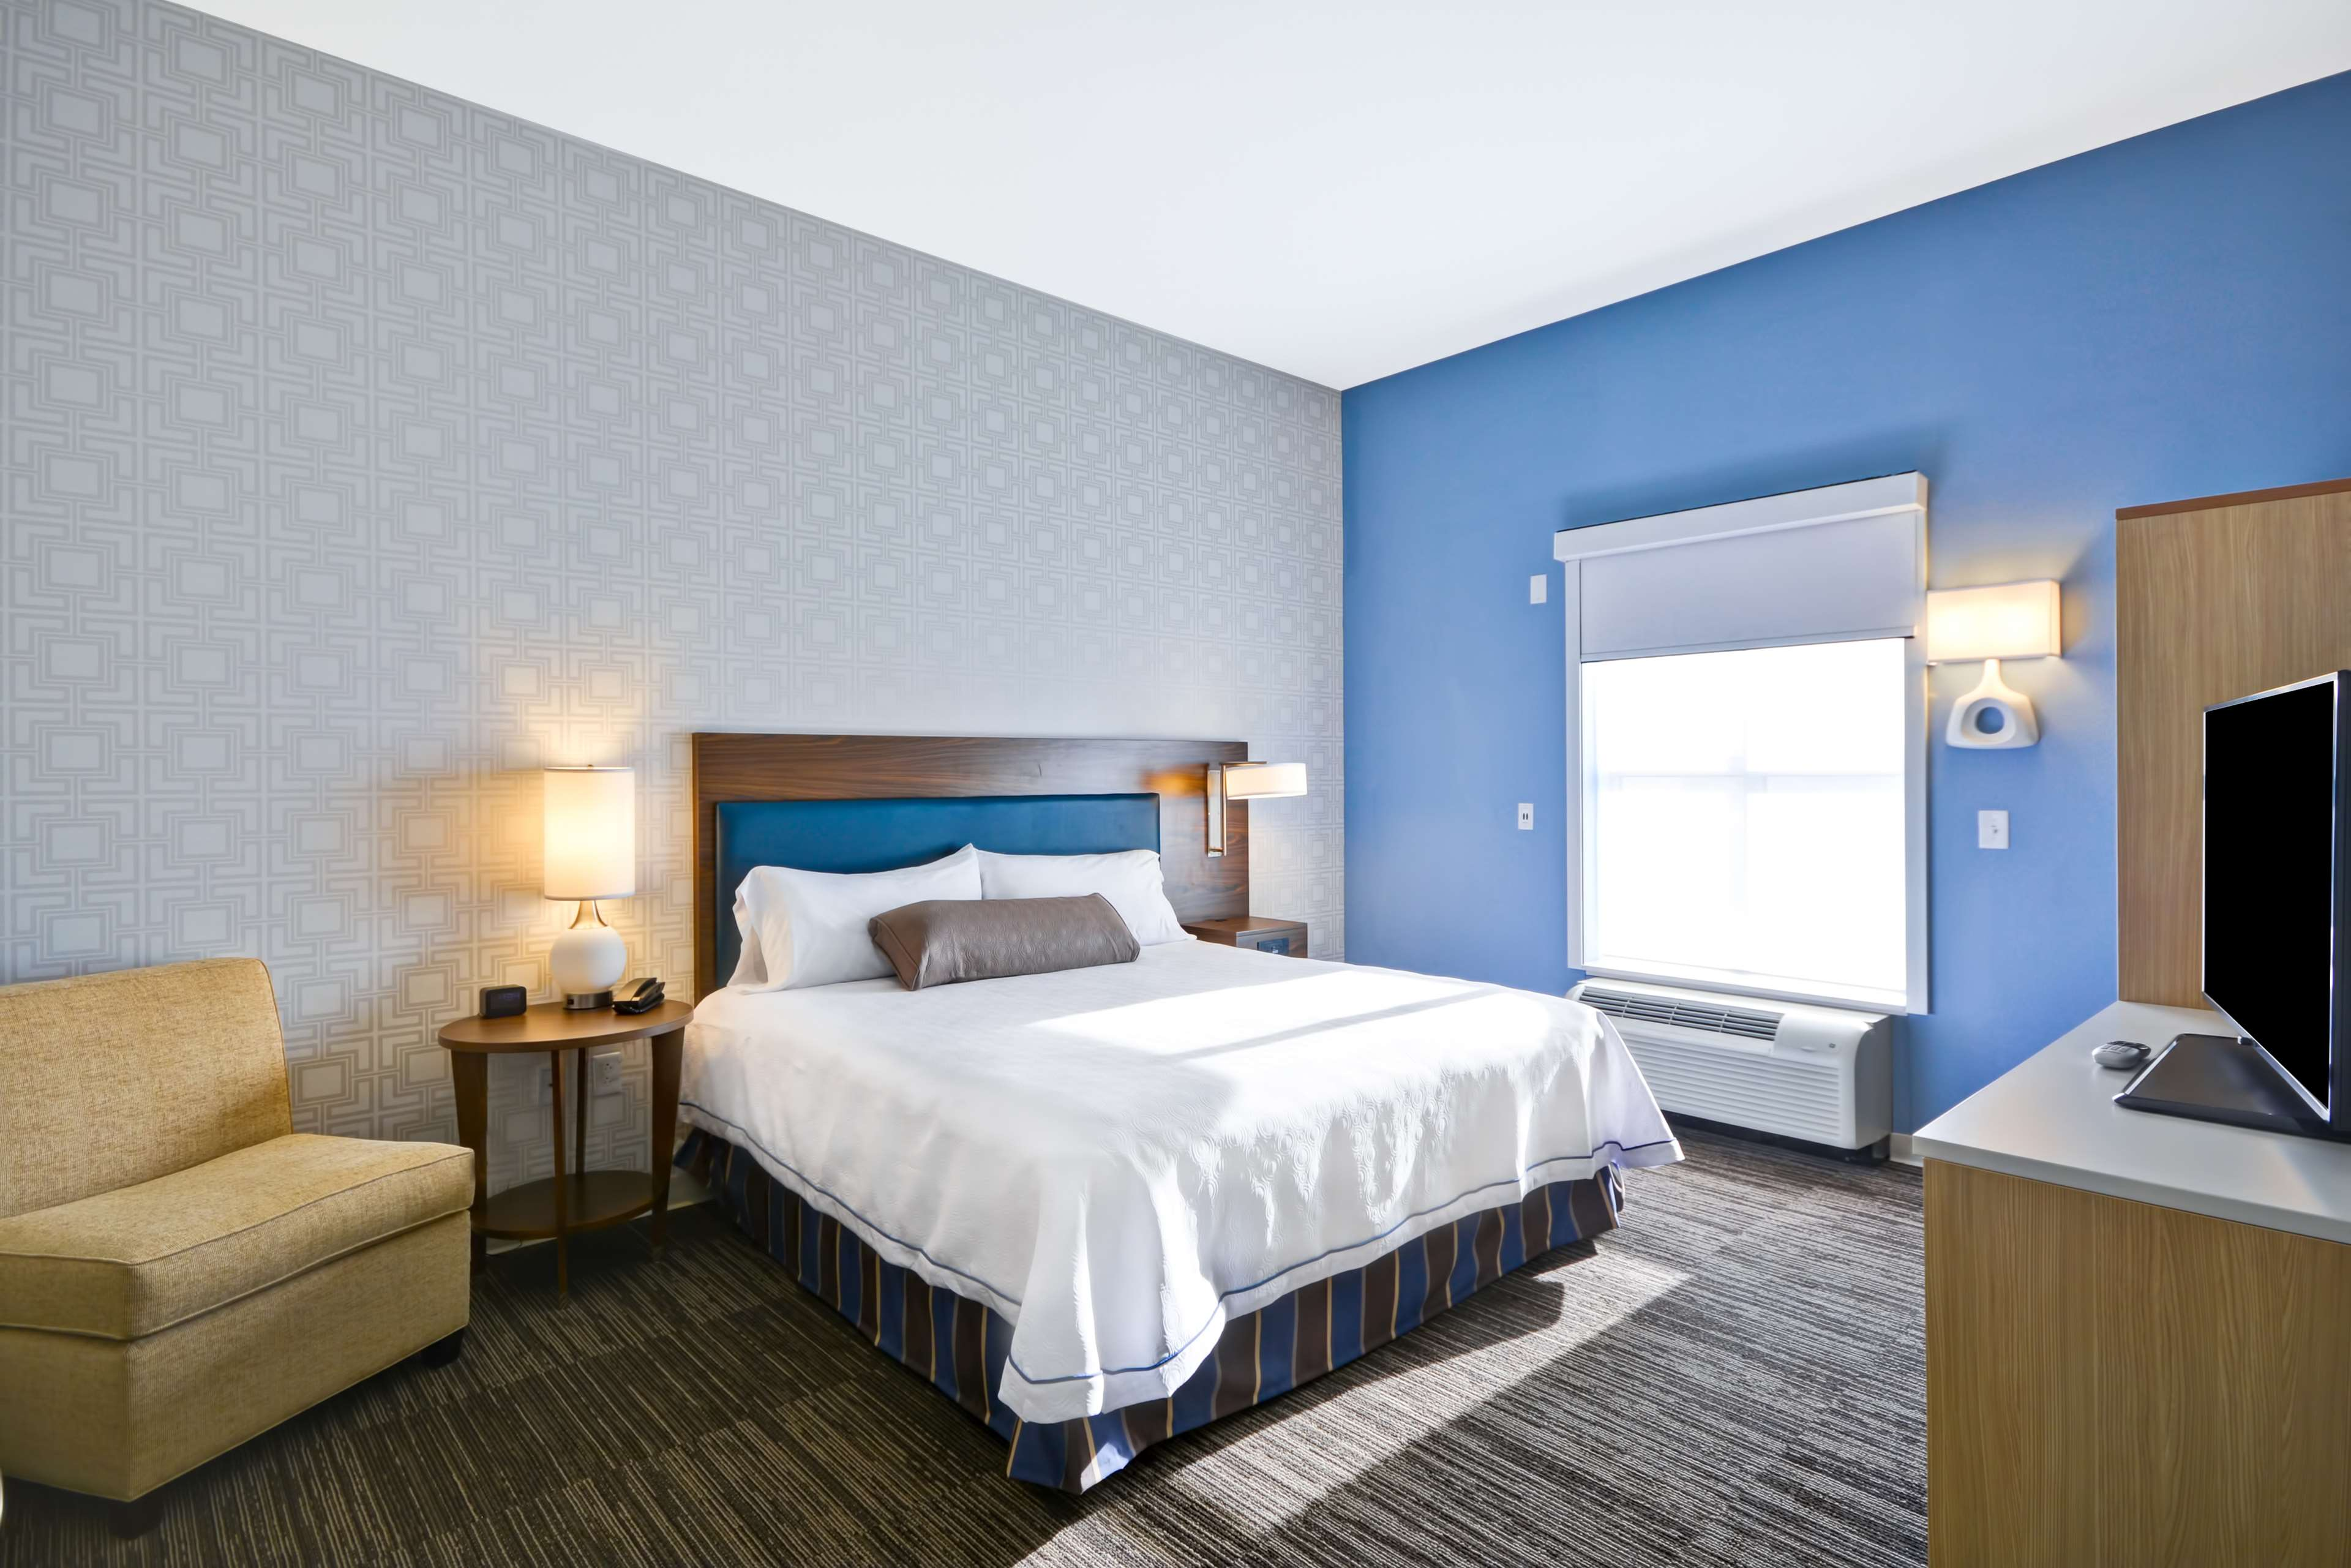 Home2 Suites by Hilton  St. Simons Island image 31